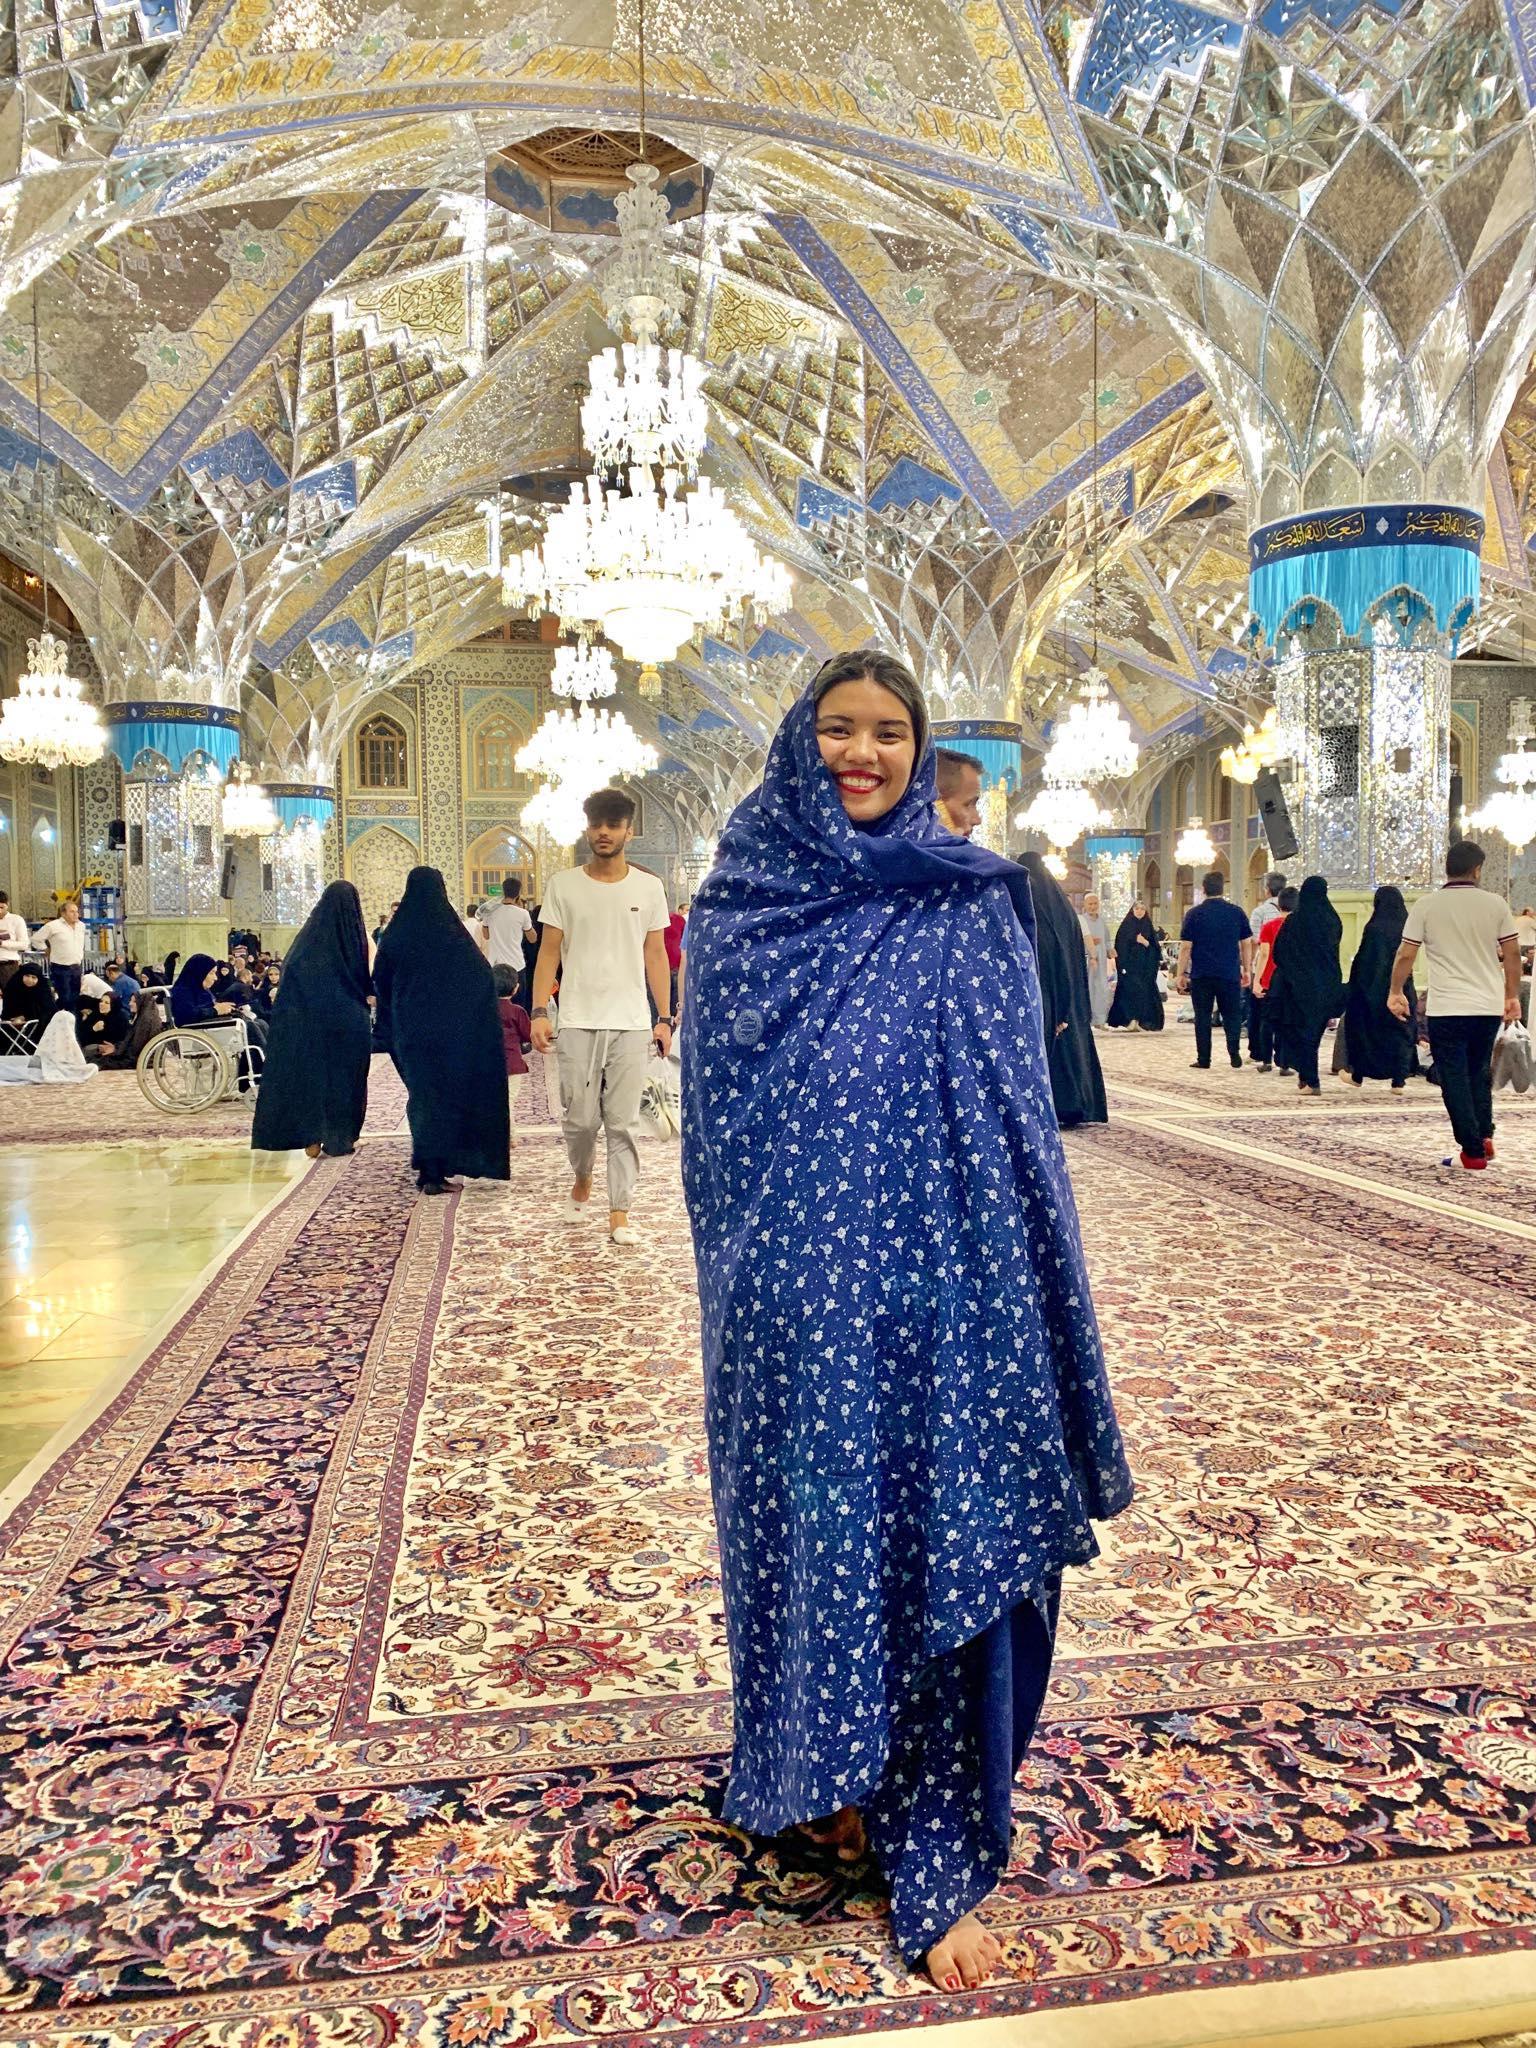 Kach Solo Travels in 2019 Overnight in Mashhad1.jpg